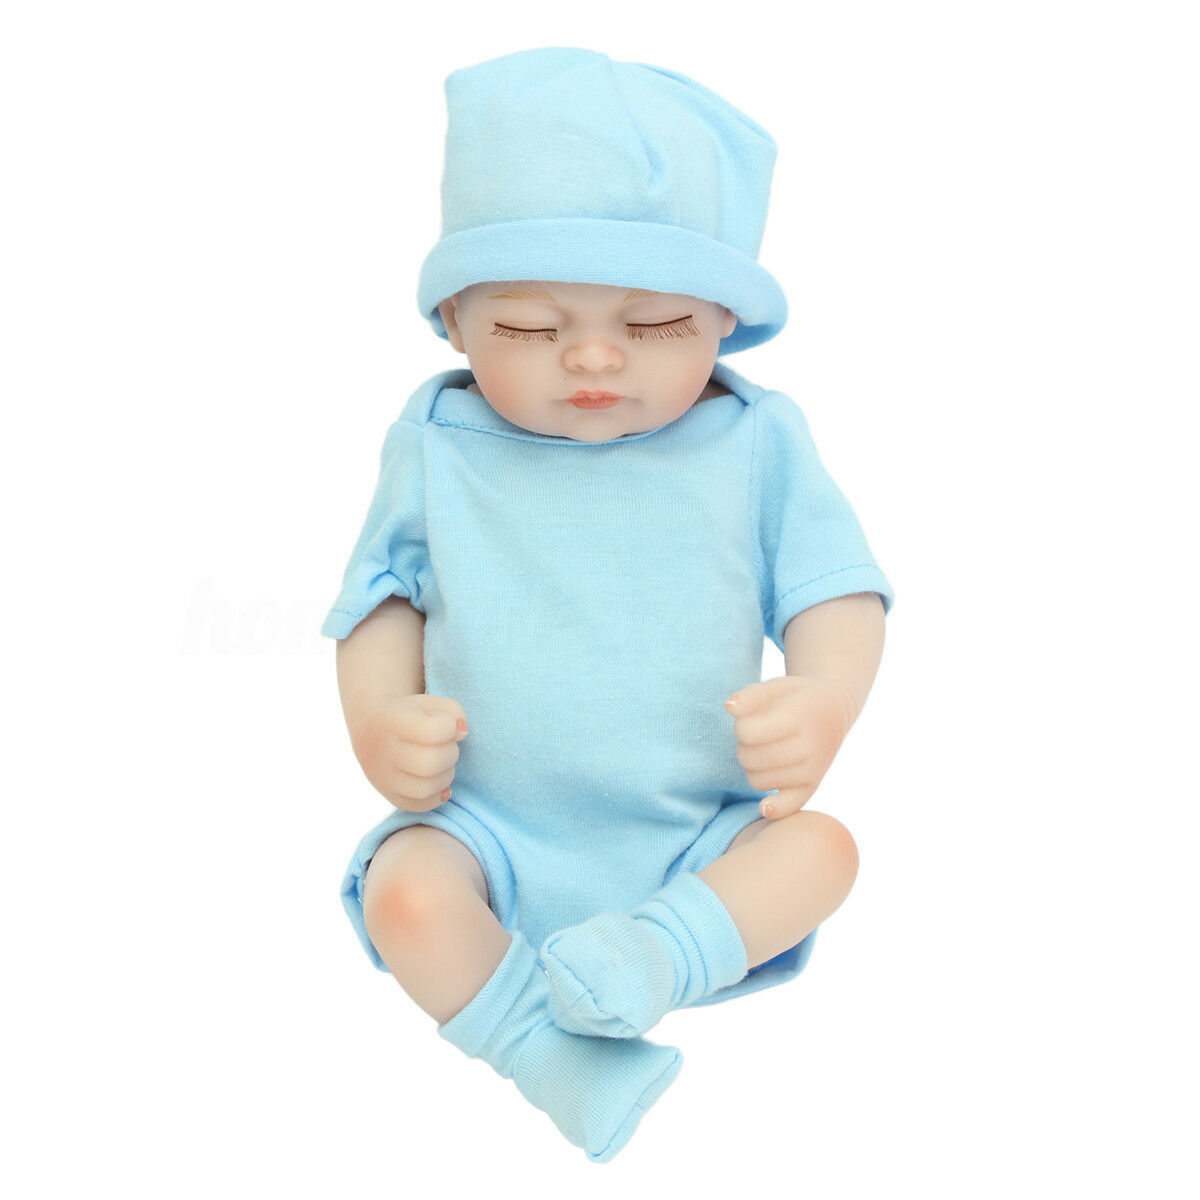 "11"" Handmade Reborn Girl Real Looking Newborn Baby Vinyl Silicone Realistic Doll"